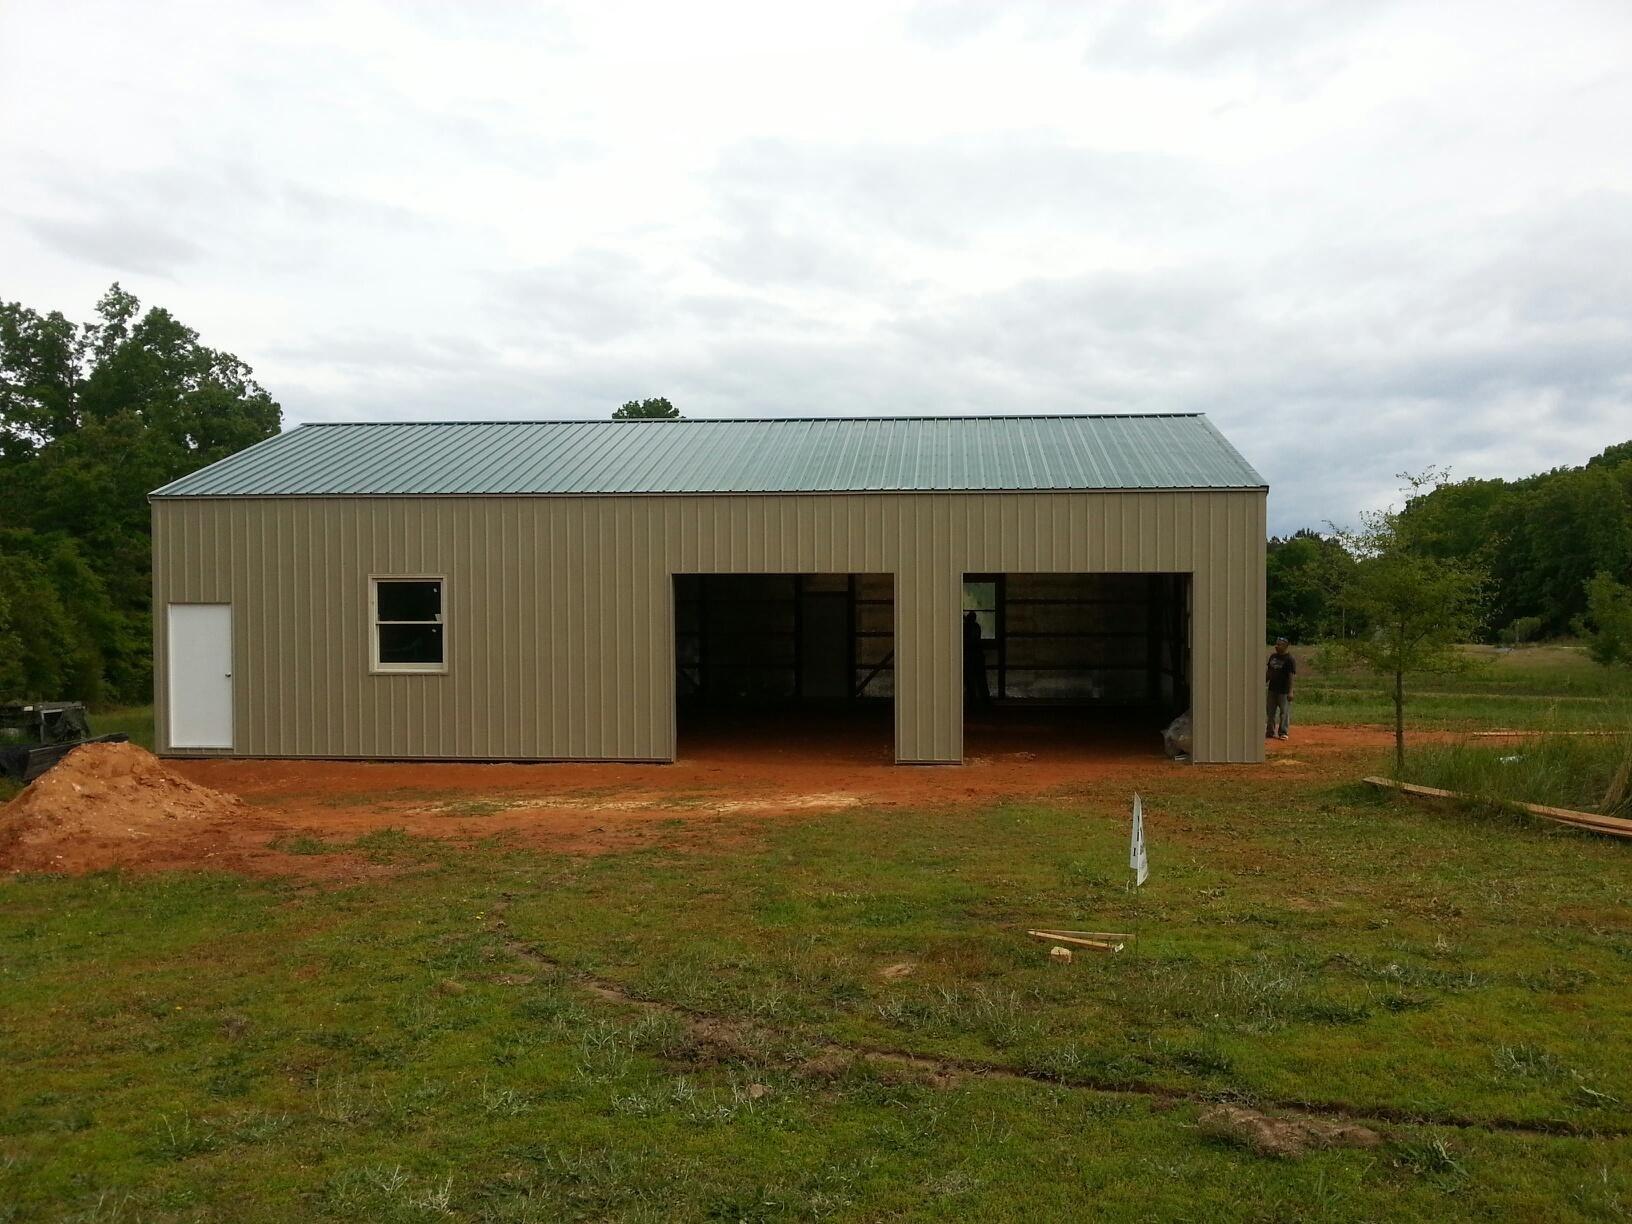 30x50x12 garage national barn for Garage building companies